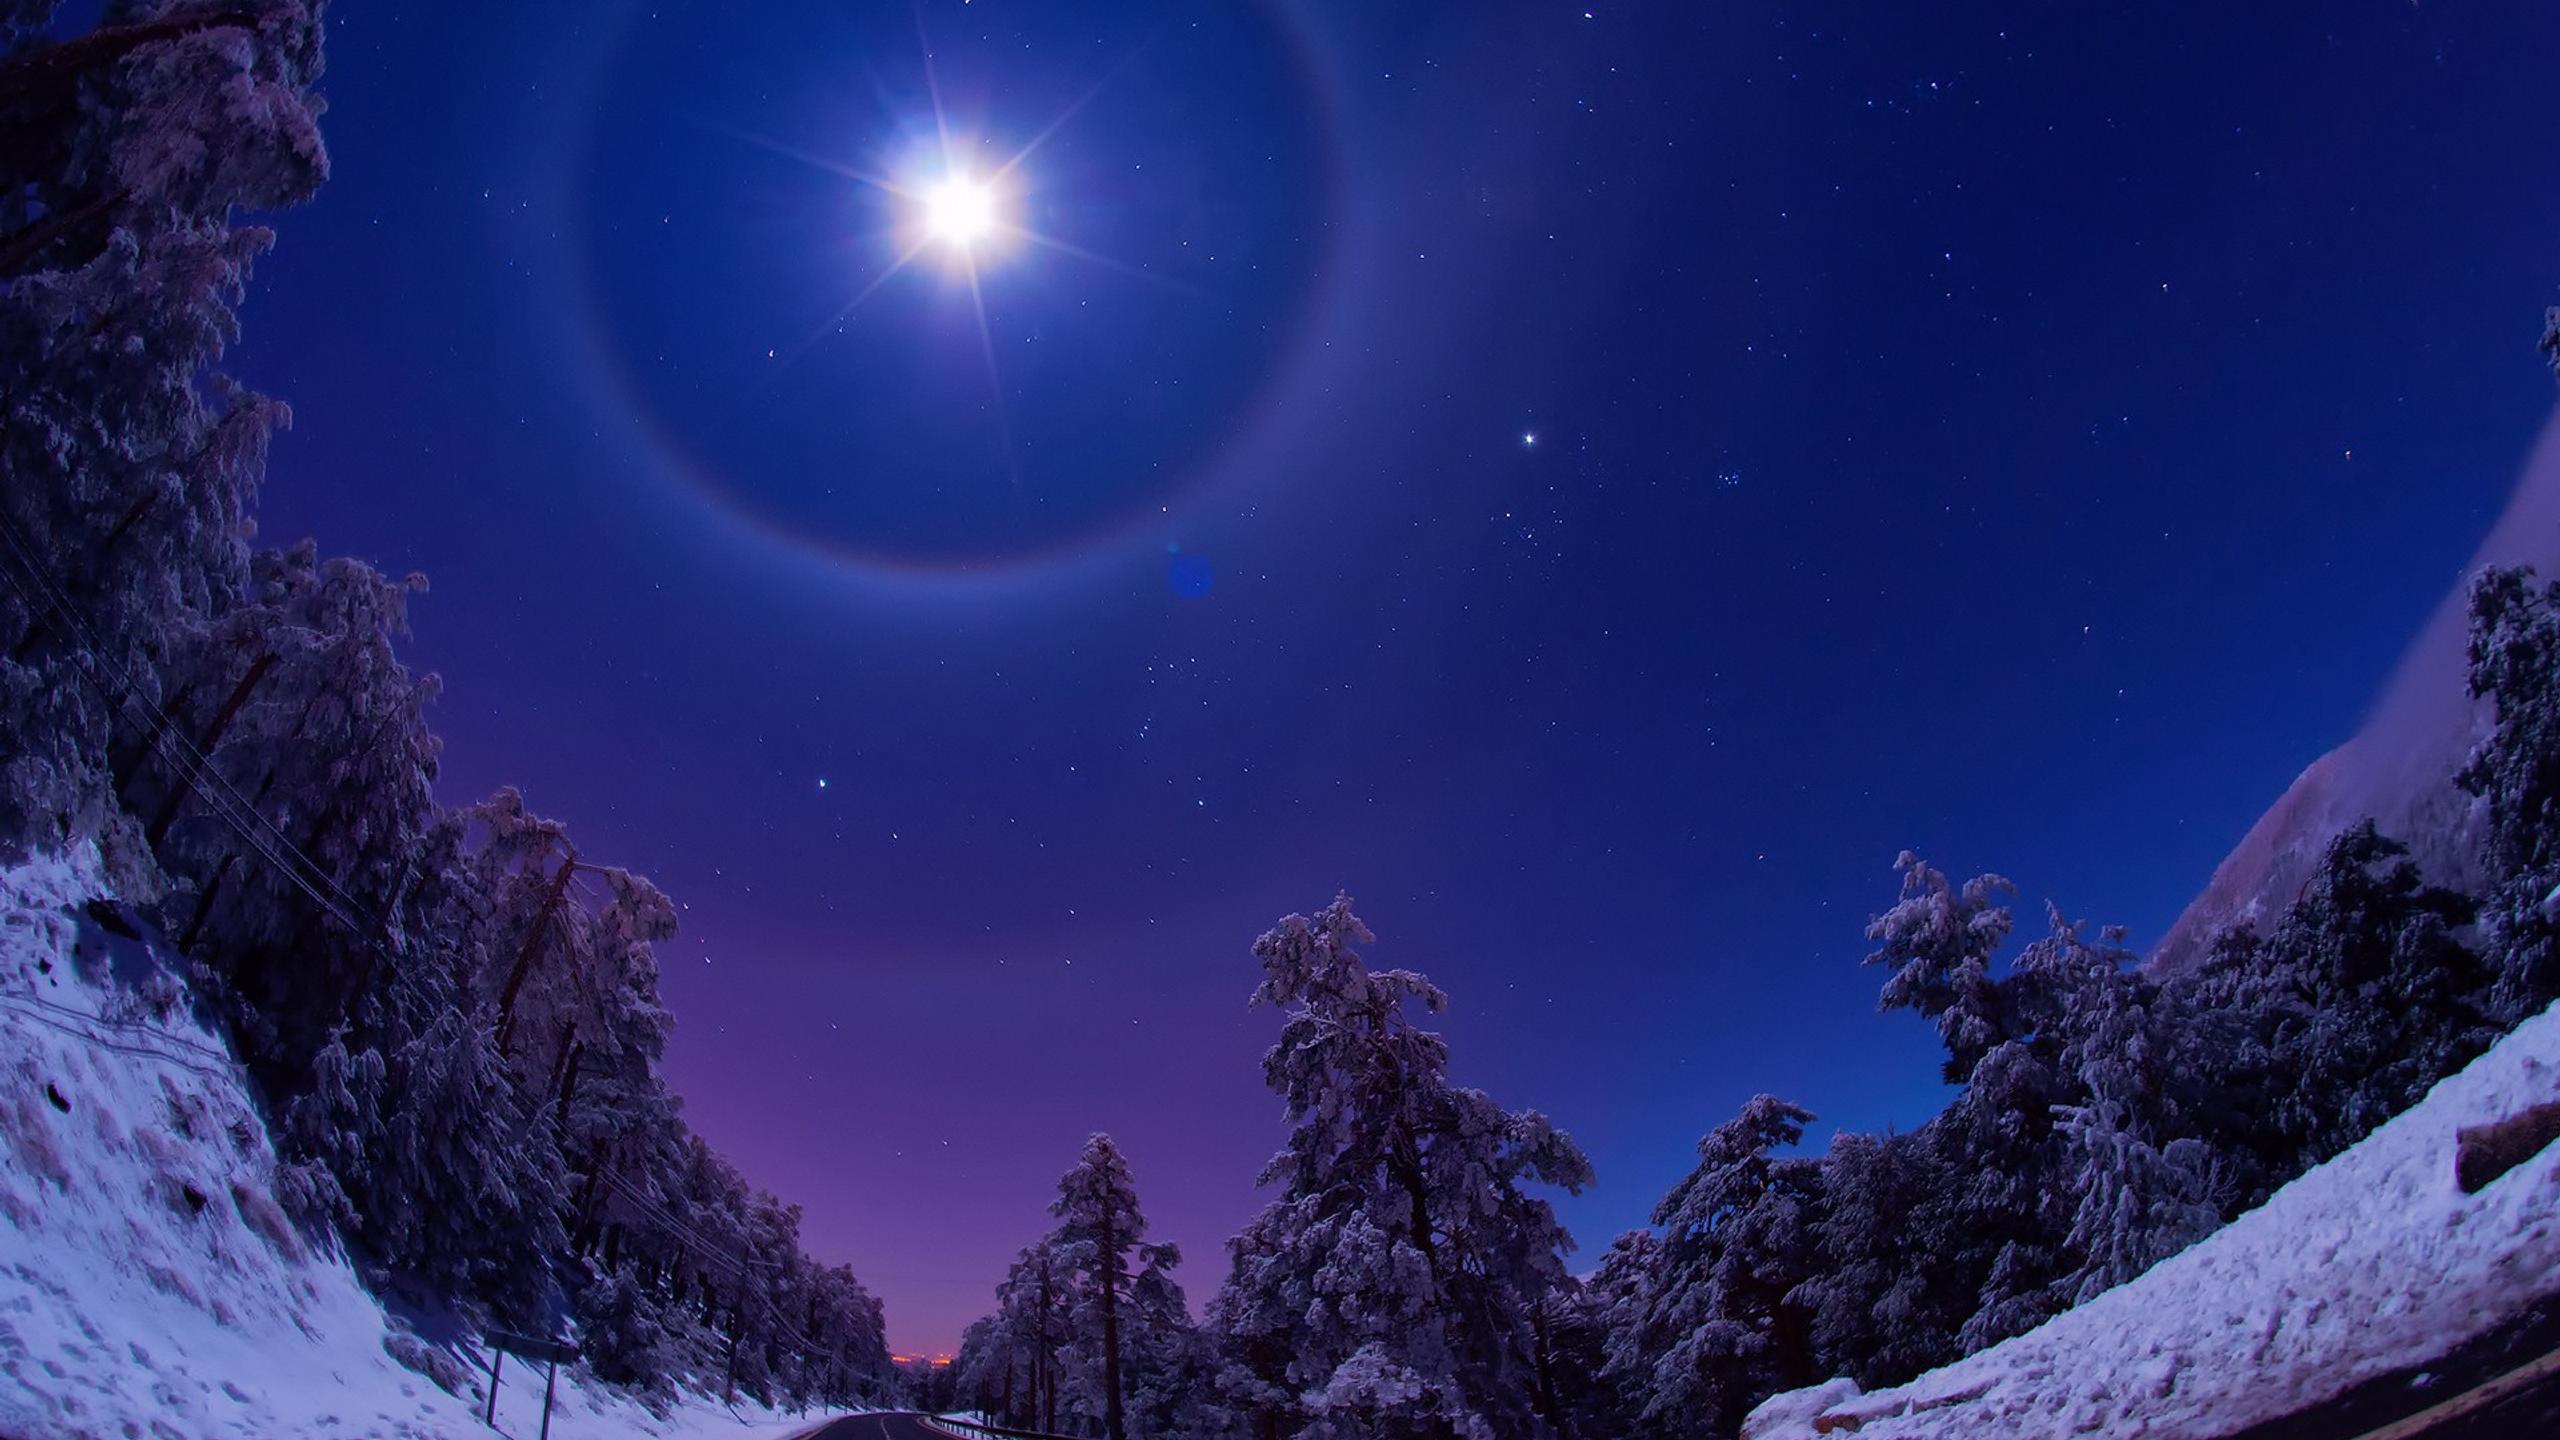 A Big Star In The Sky Brightenss Winter Night Wallpaper Download 2560x1440